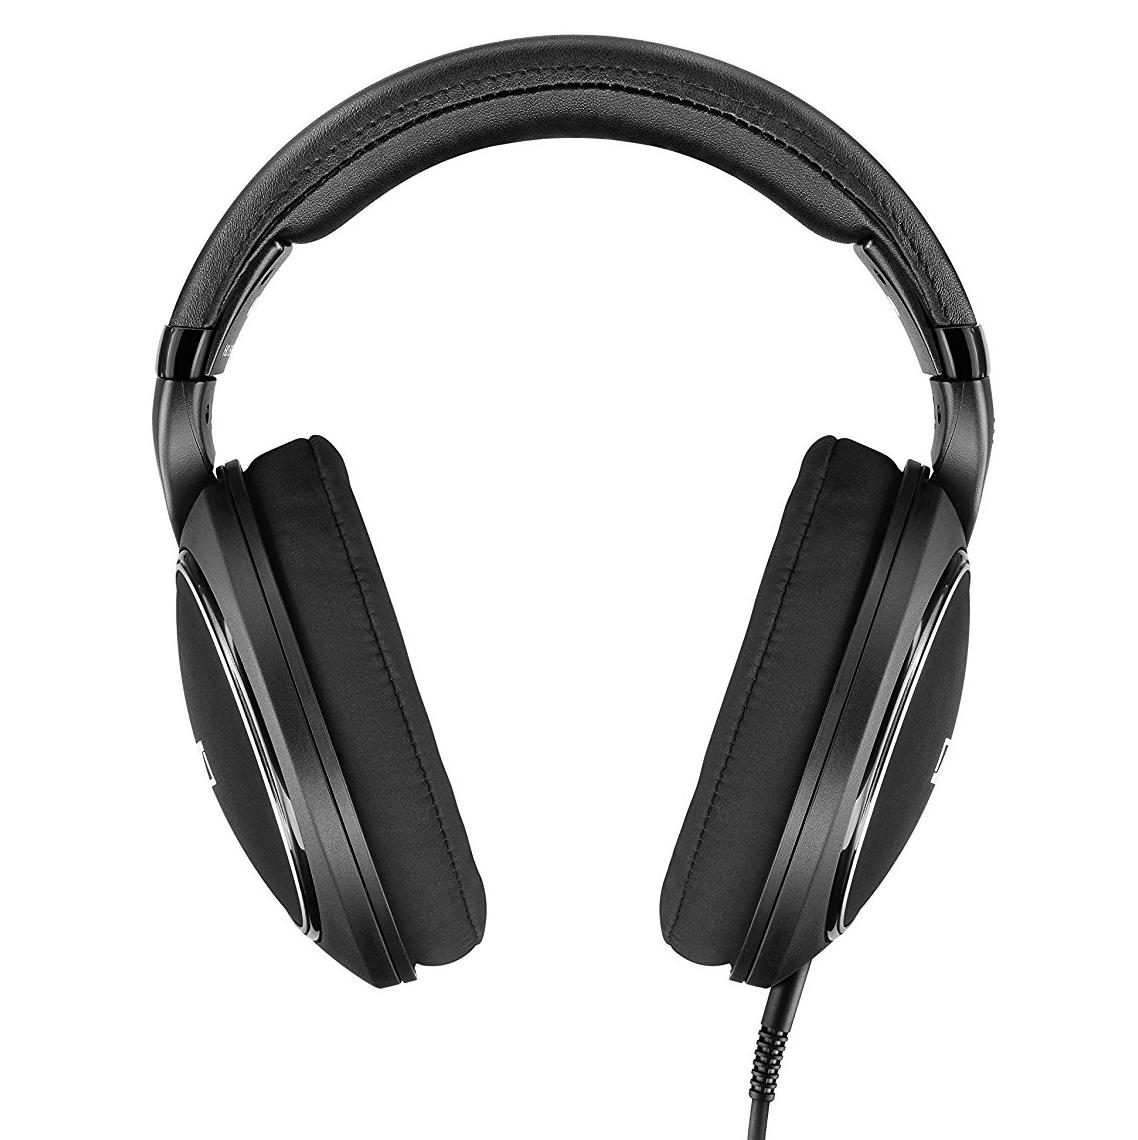 sennheiser, hd 598 Cs, closed back, headphones, audiophile, mobile,